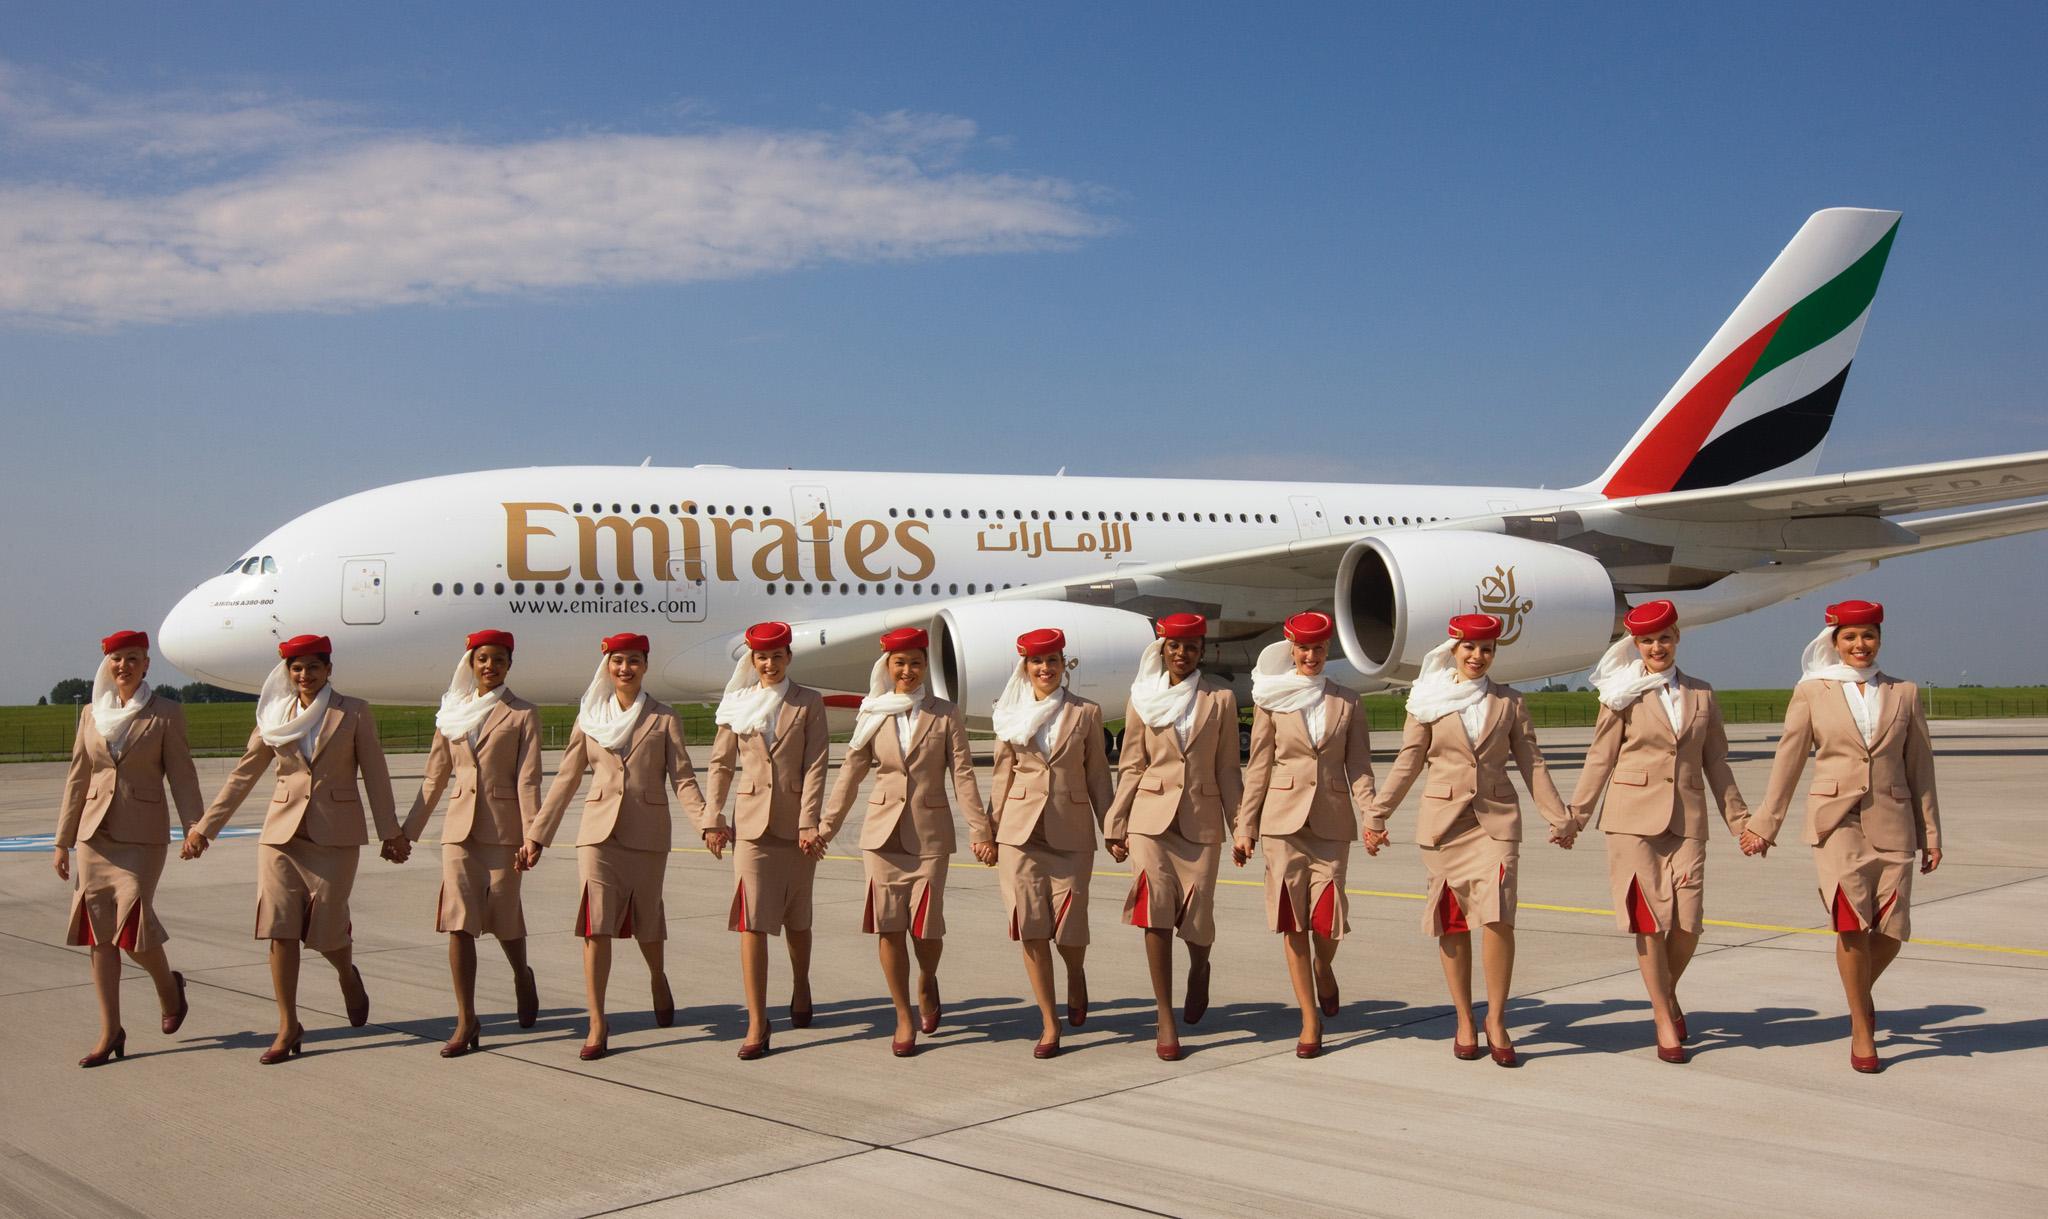 Emirates A380 & cabin crew